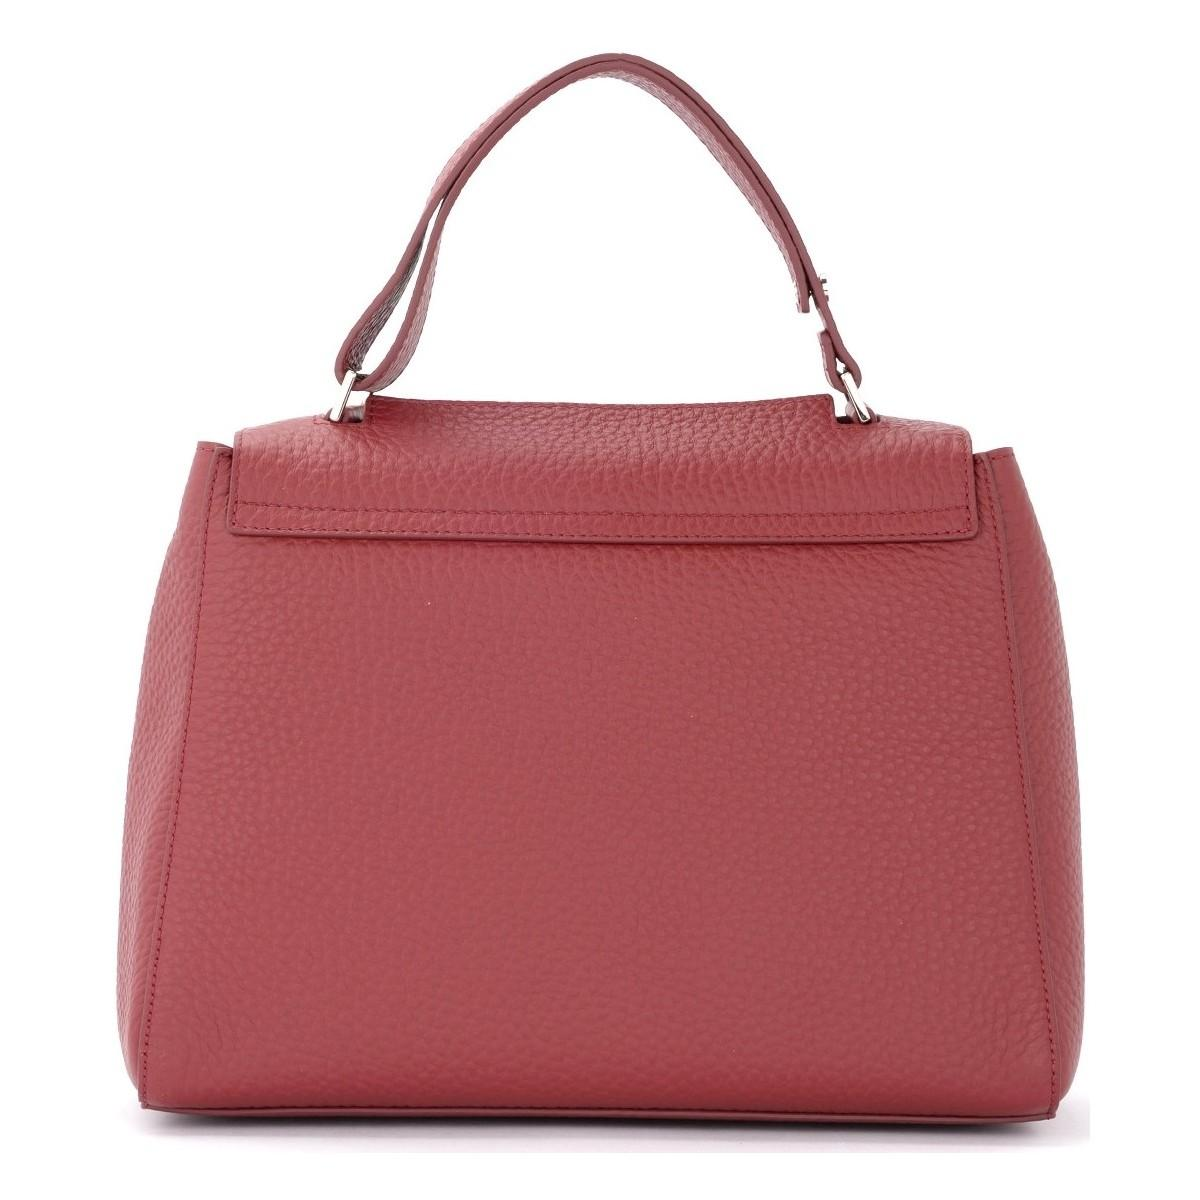 Orciani Handtasche Handtasche Sveva Medium aus genarbtem Bordeauxfarbenem Leder in Rot 8I8KA